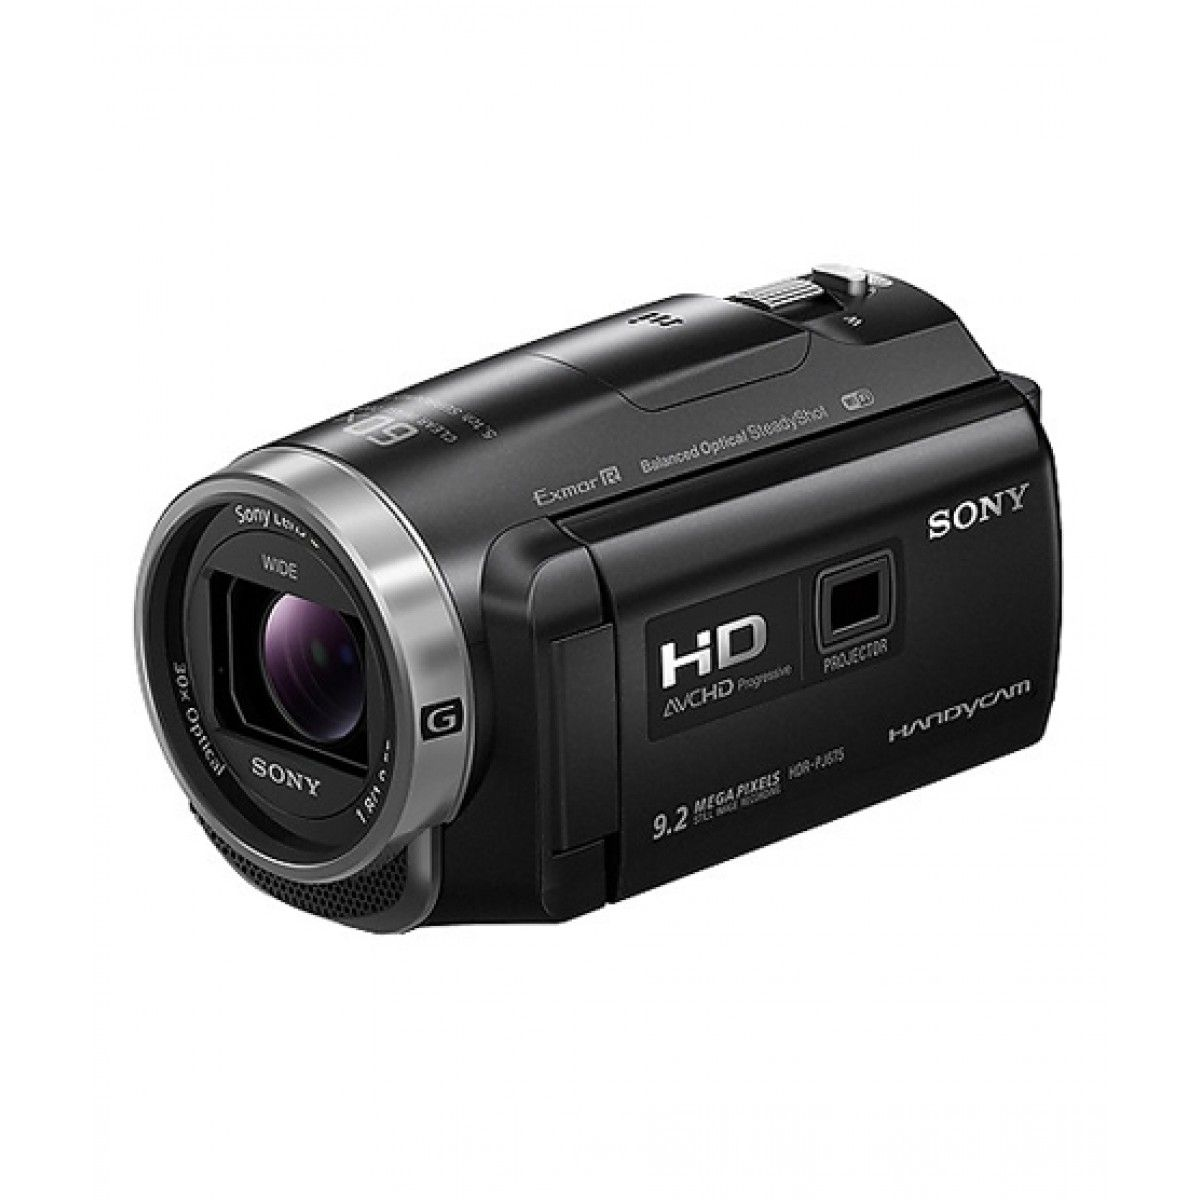 Sony Full HD Handycam HDR-PJ675